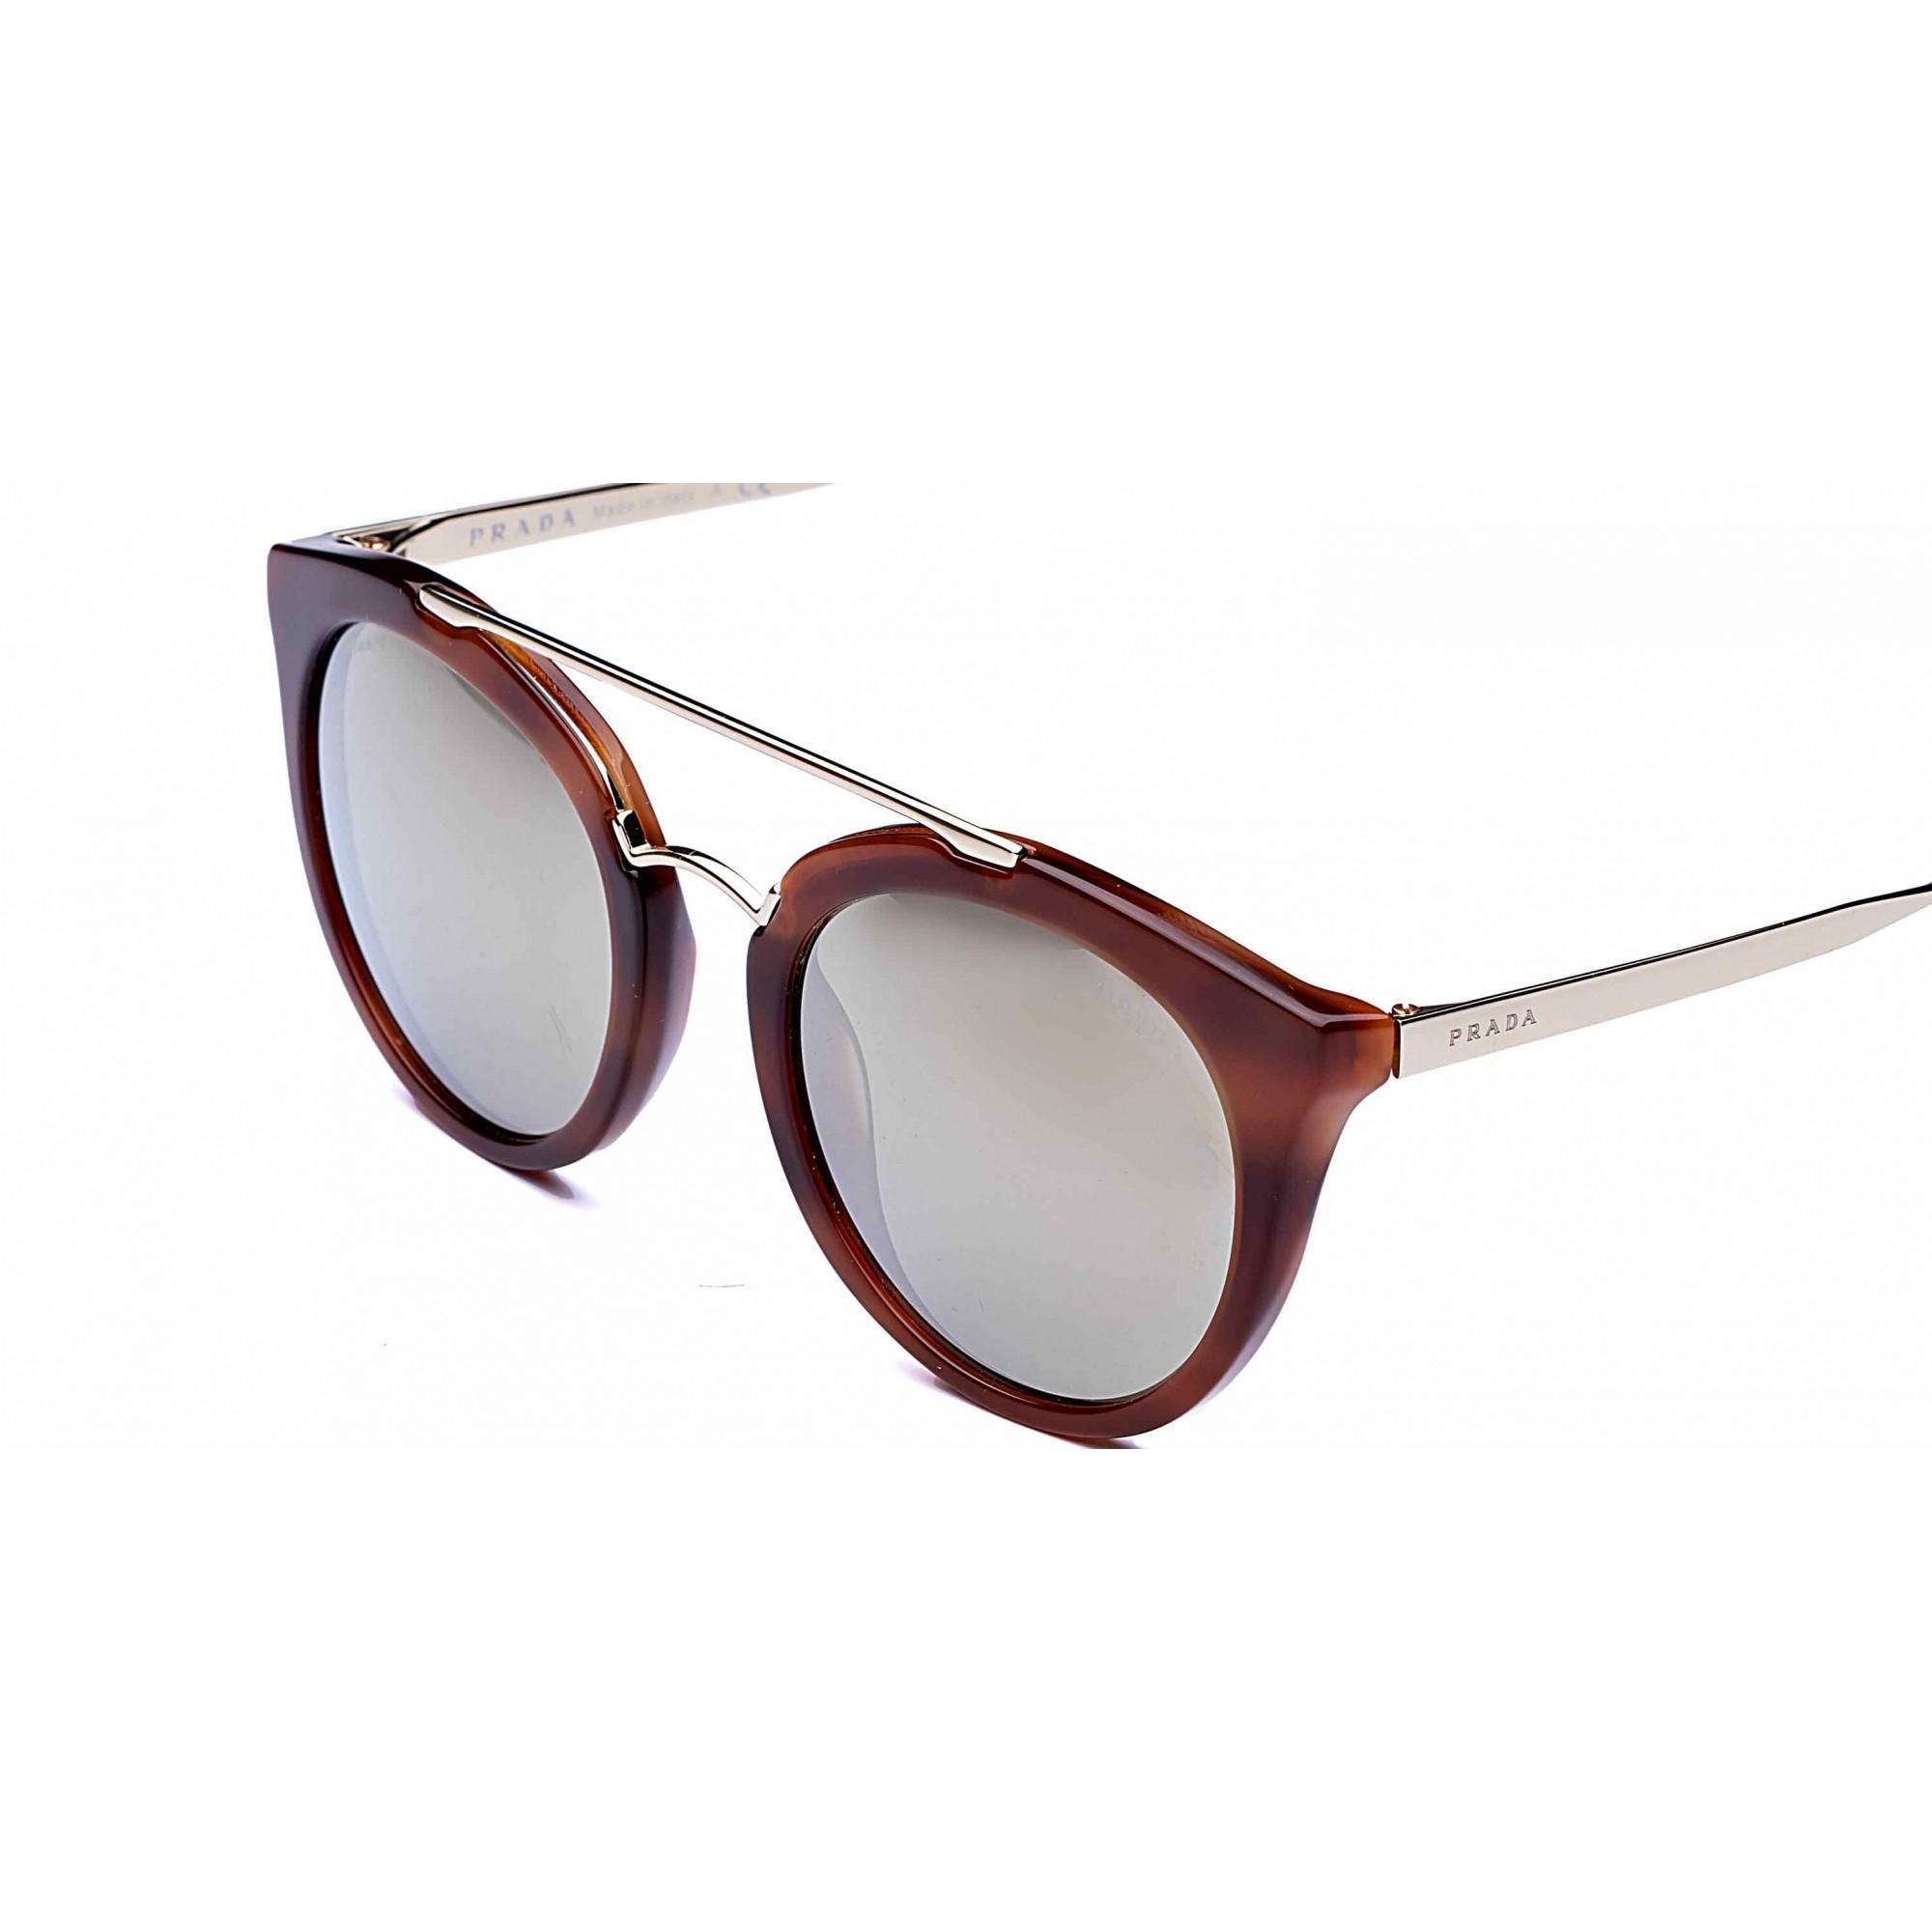 Óculos de Sol SPR23S Prada - Original